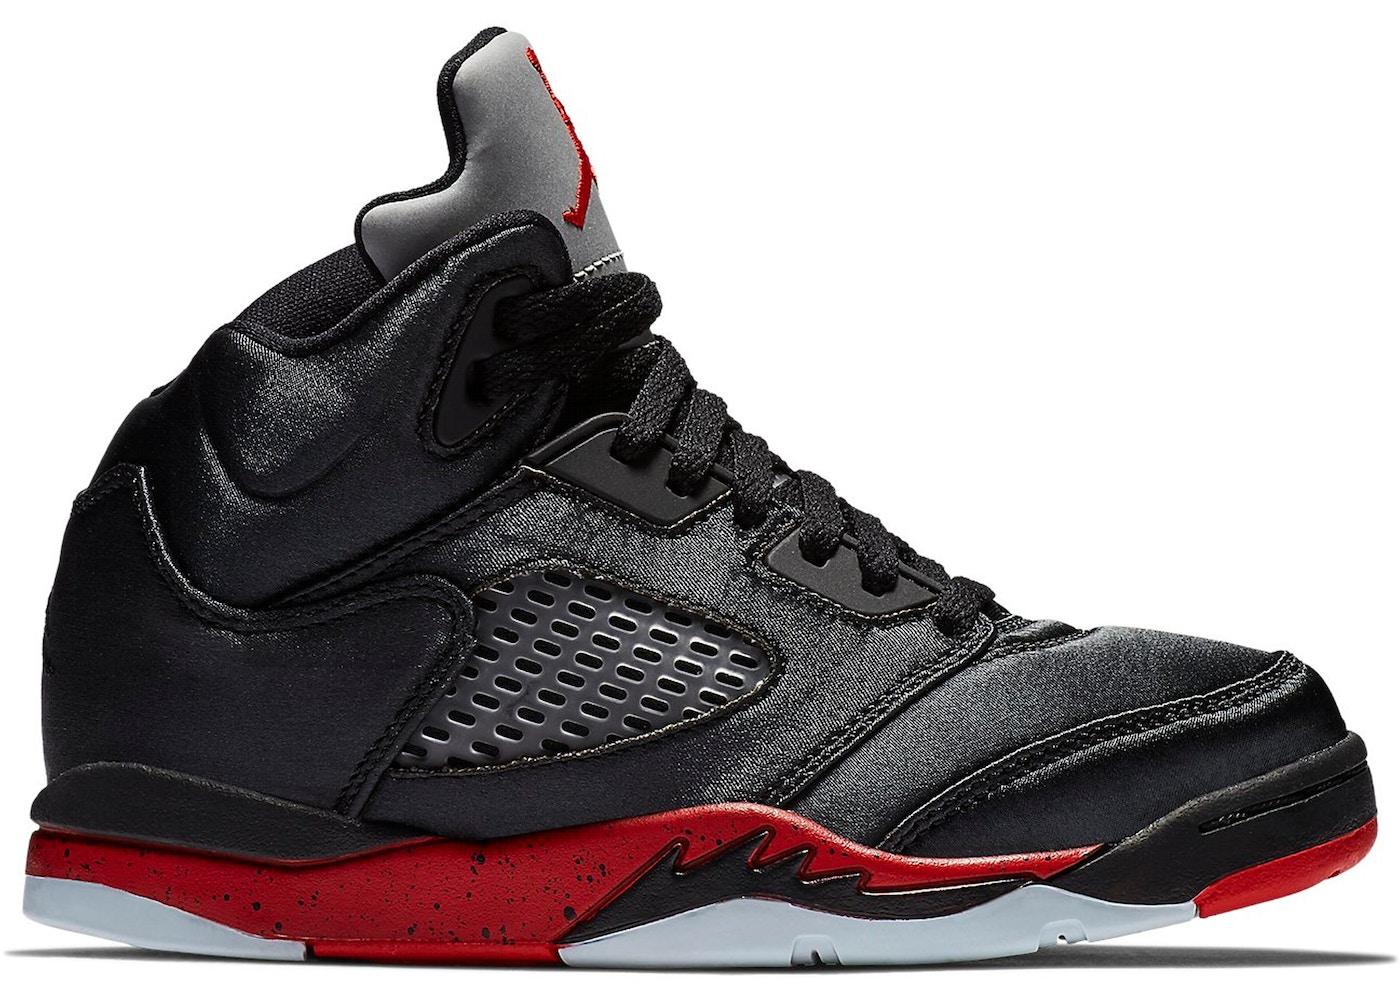 4323b7cfa64 Buy Air Jordan 5 Size 13 Shoes & Deadstock Sneakers